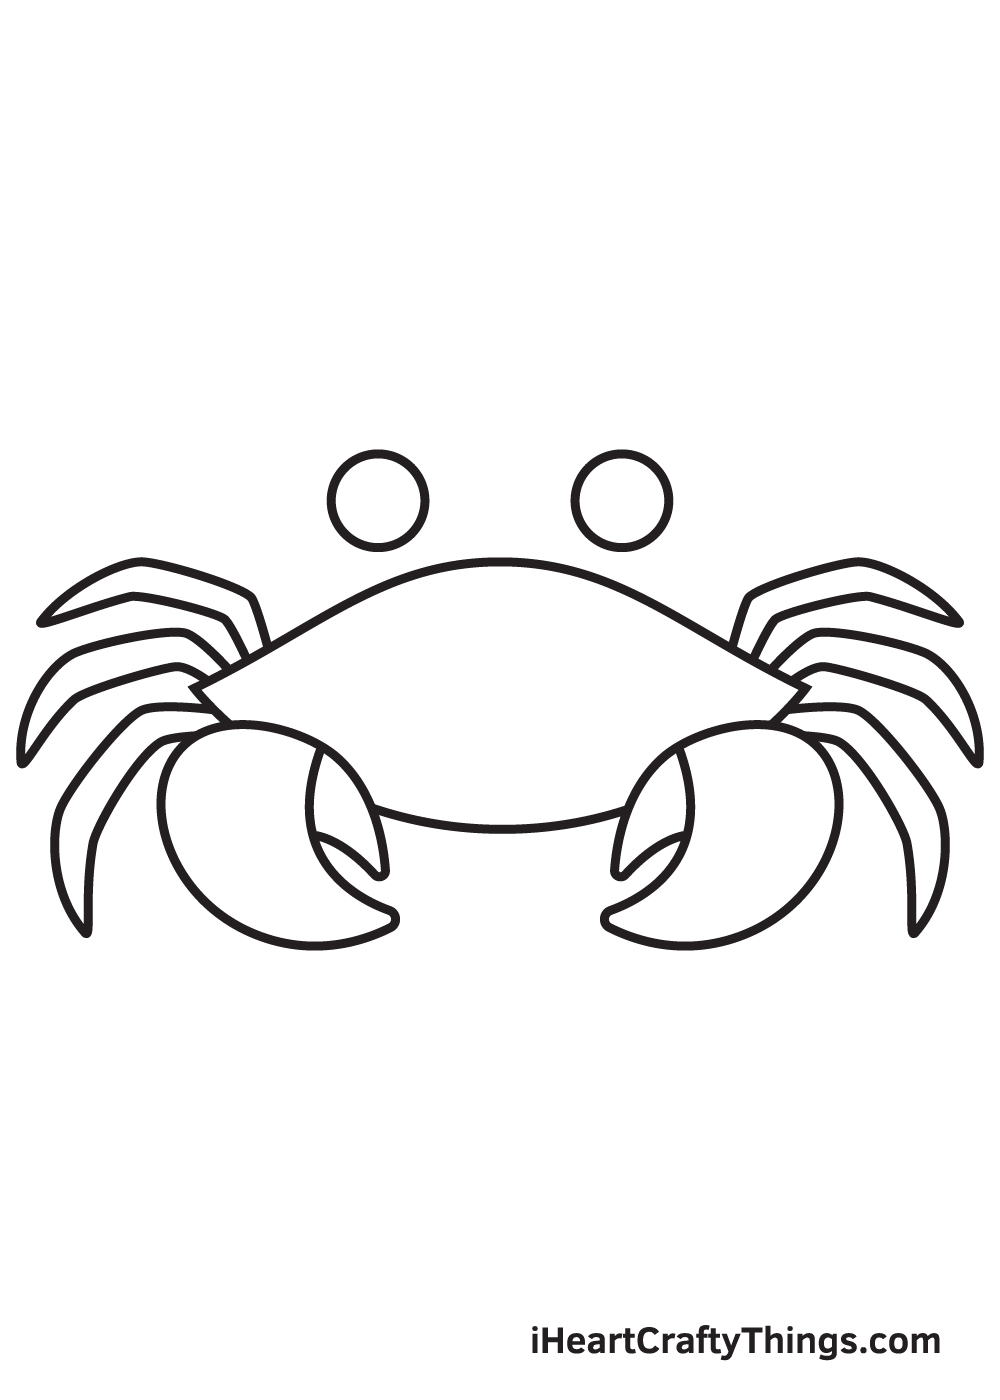 Crab Drawing – Step 6